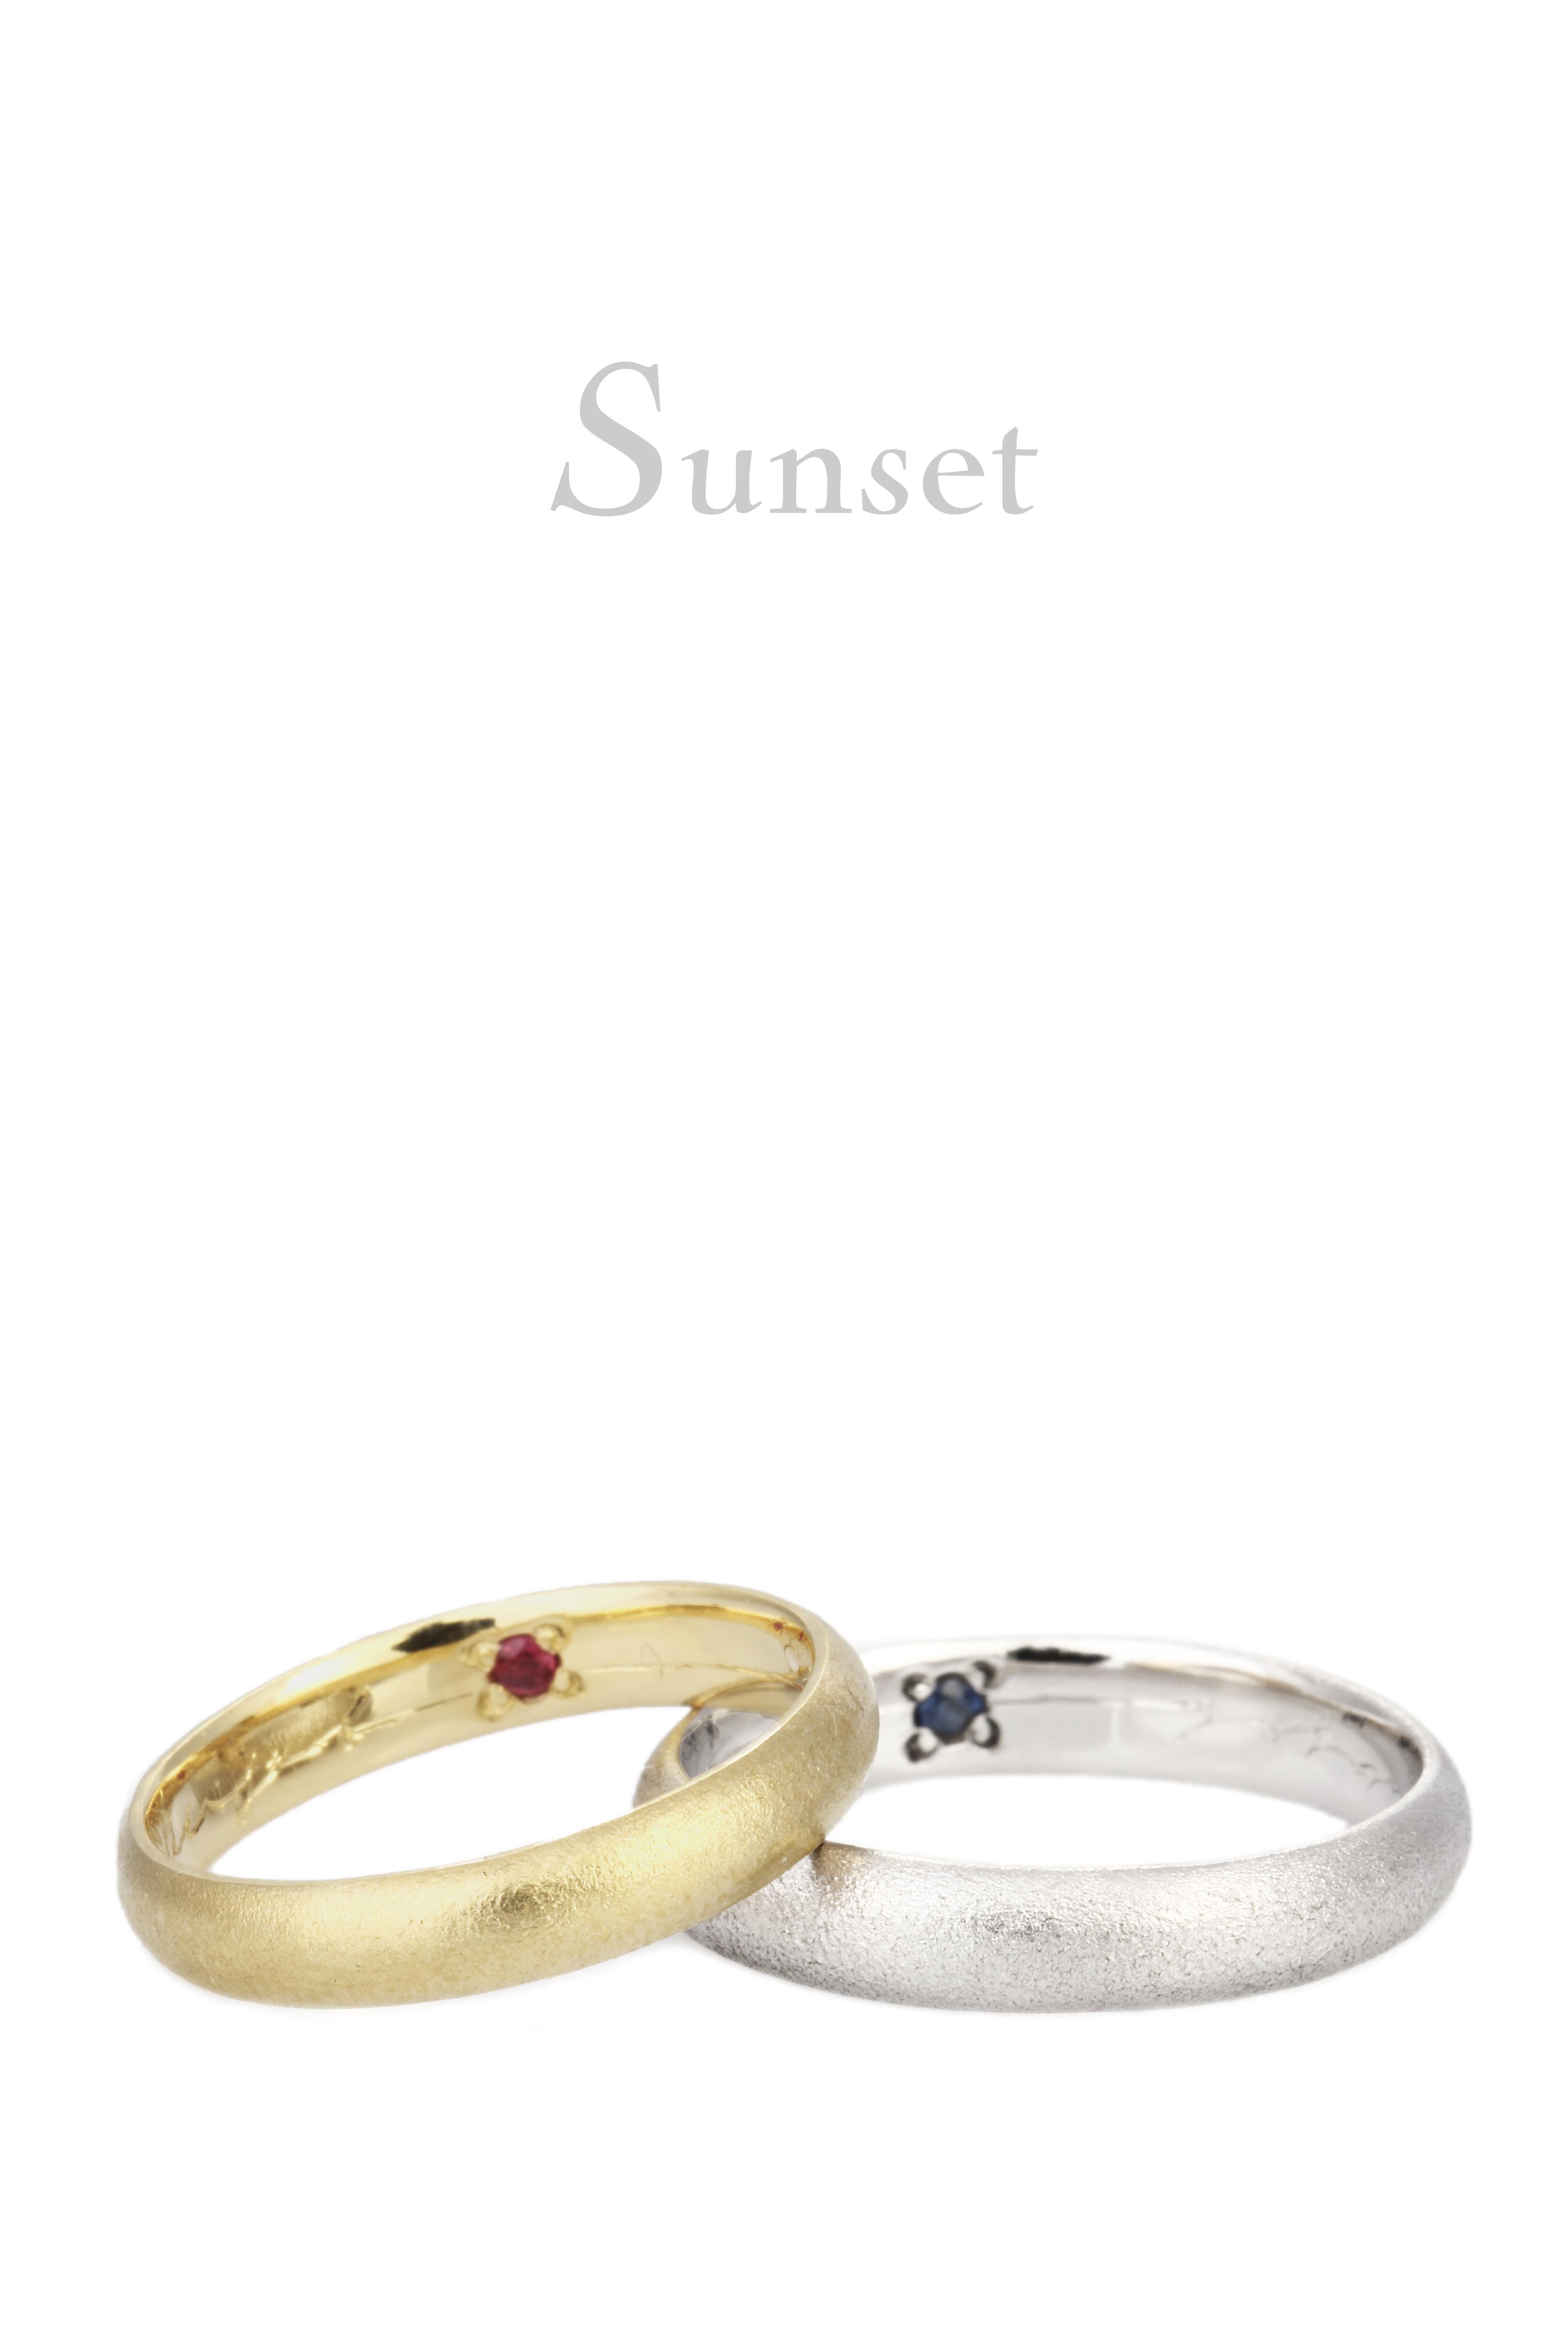 iddo-art-jewelry002.jpg